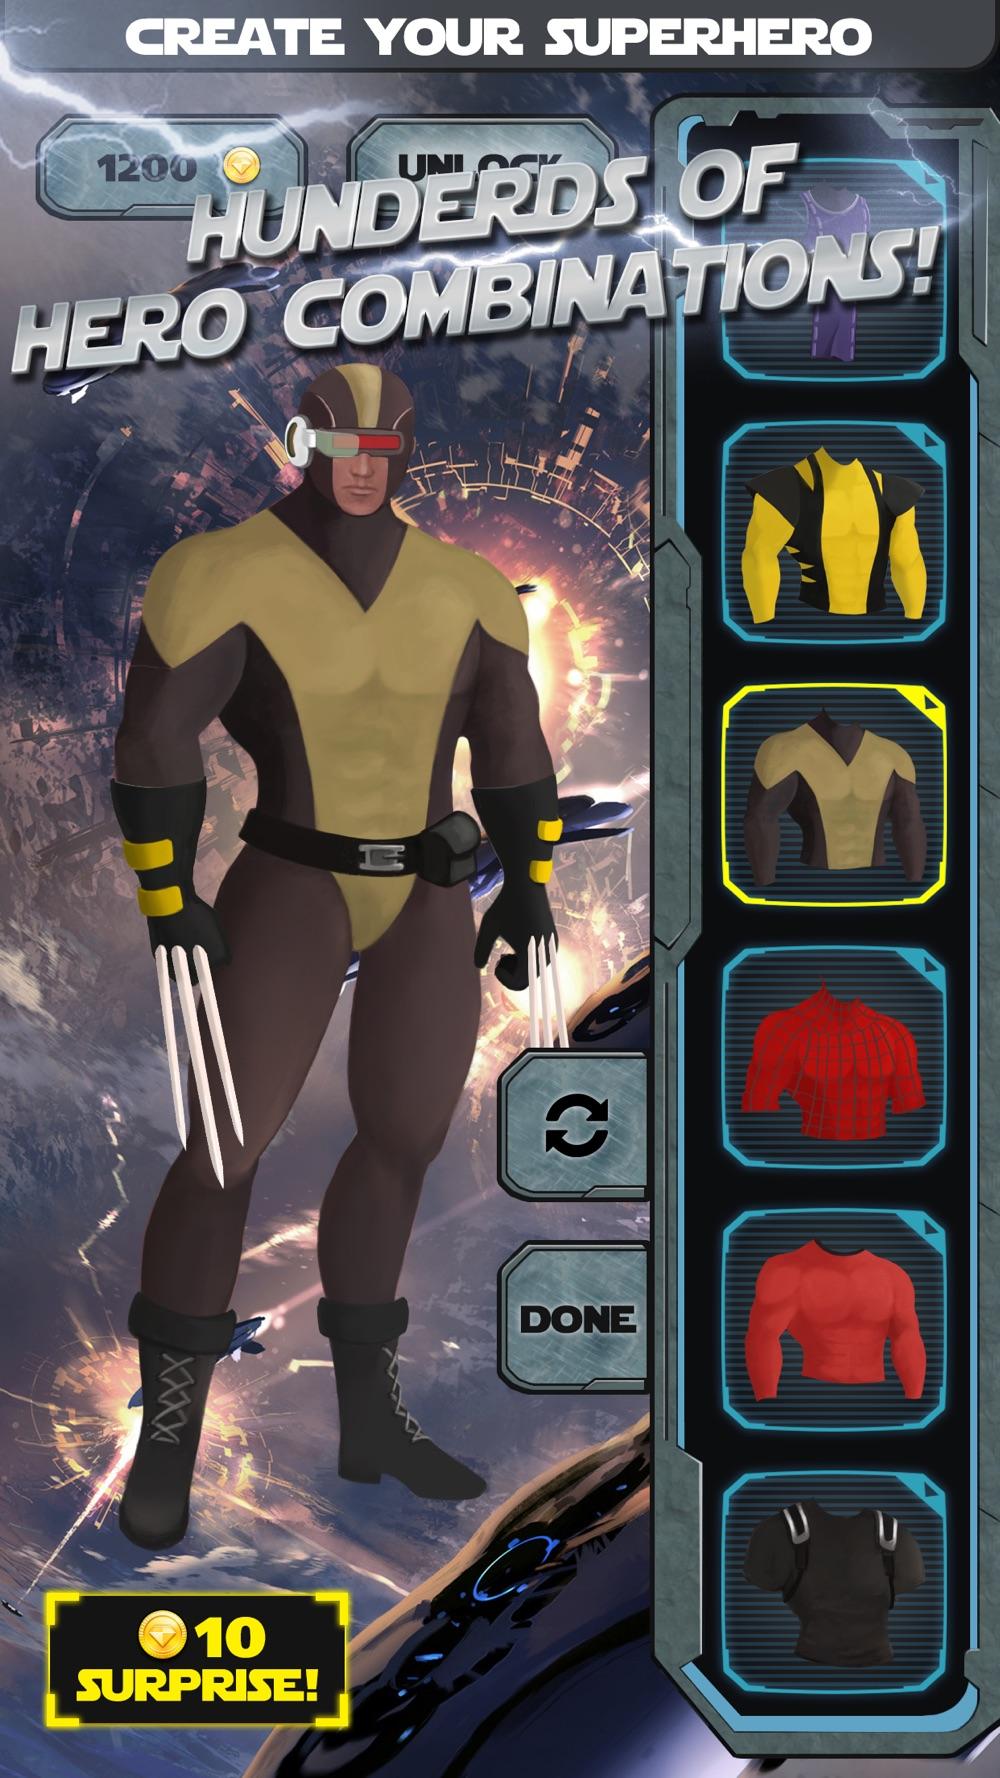 Superhero Creator - Super Hero Character Costume Maker & Dress Up Game for Man FREE hack tool